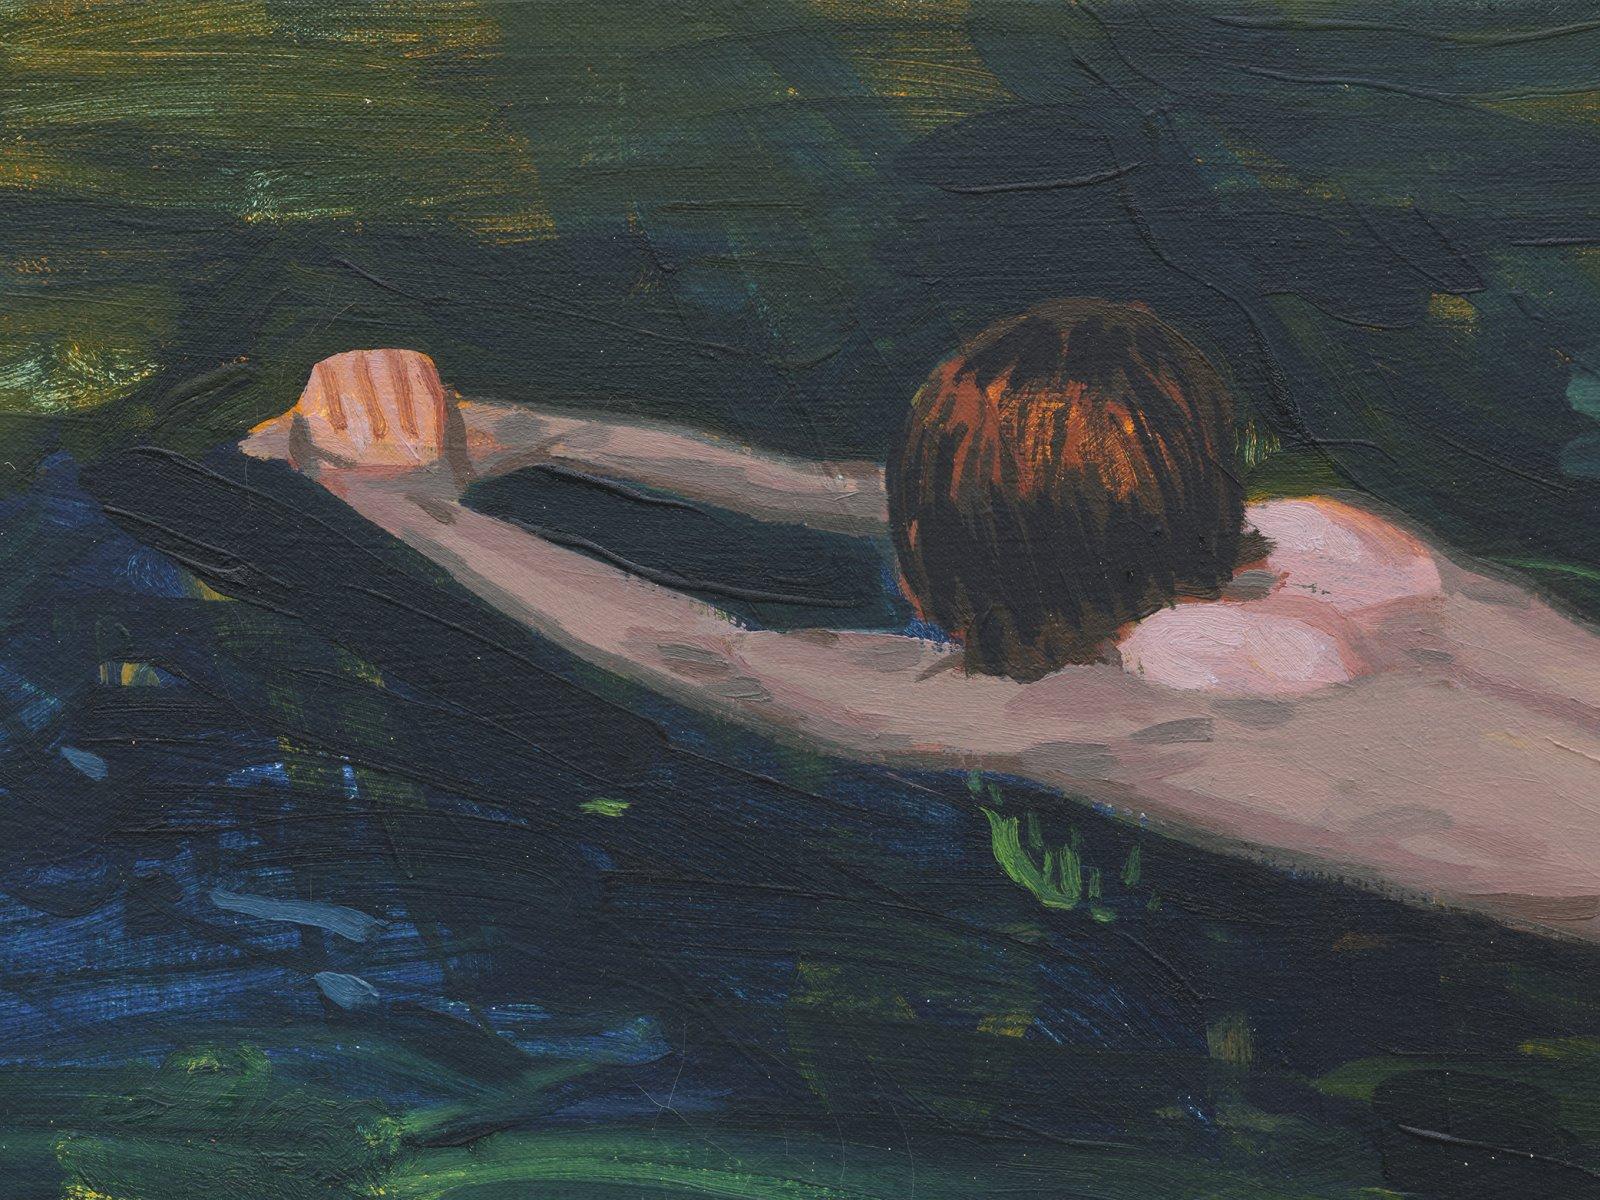 Damian Moppett, Untitled (Green Swimming) (detail), 2020, oil on canvas, 27 x 32 in. (69 x 82 cm) by Damian Moppett